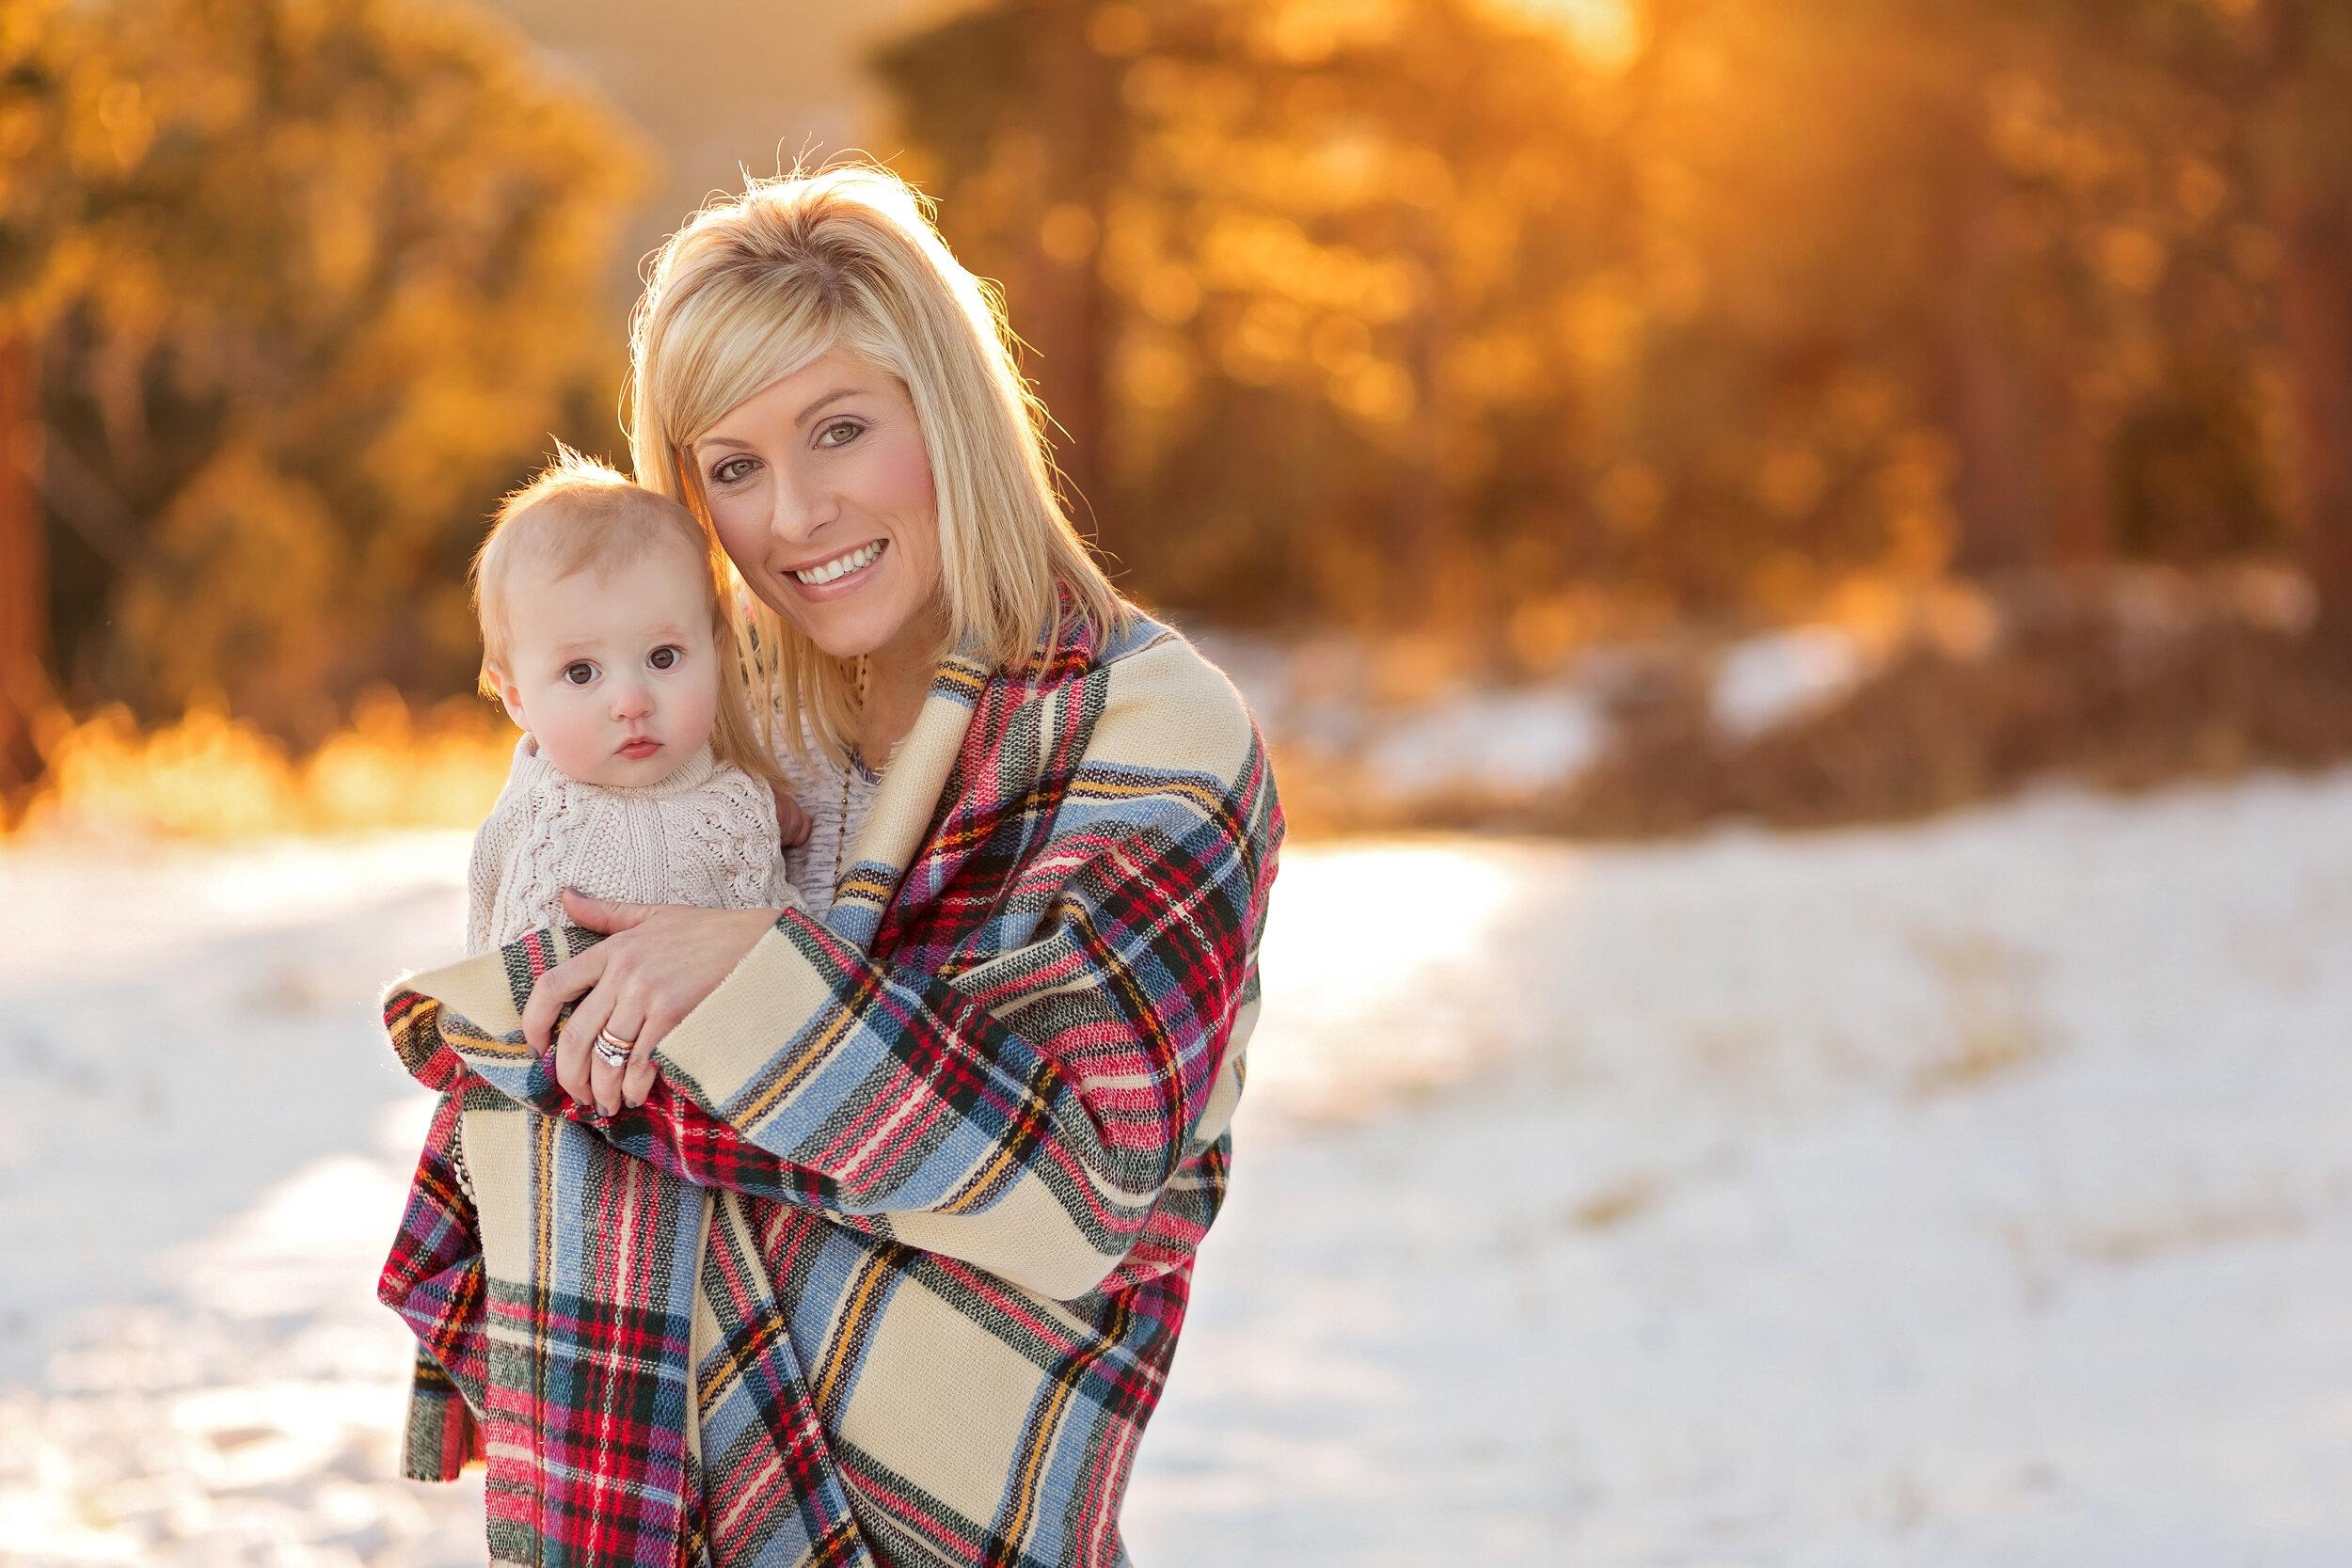 Denver+Snow+Family+Photos.jpeg